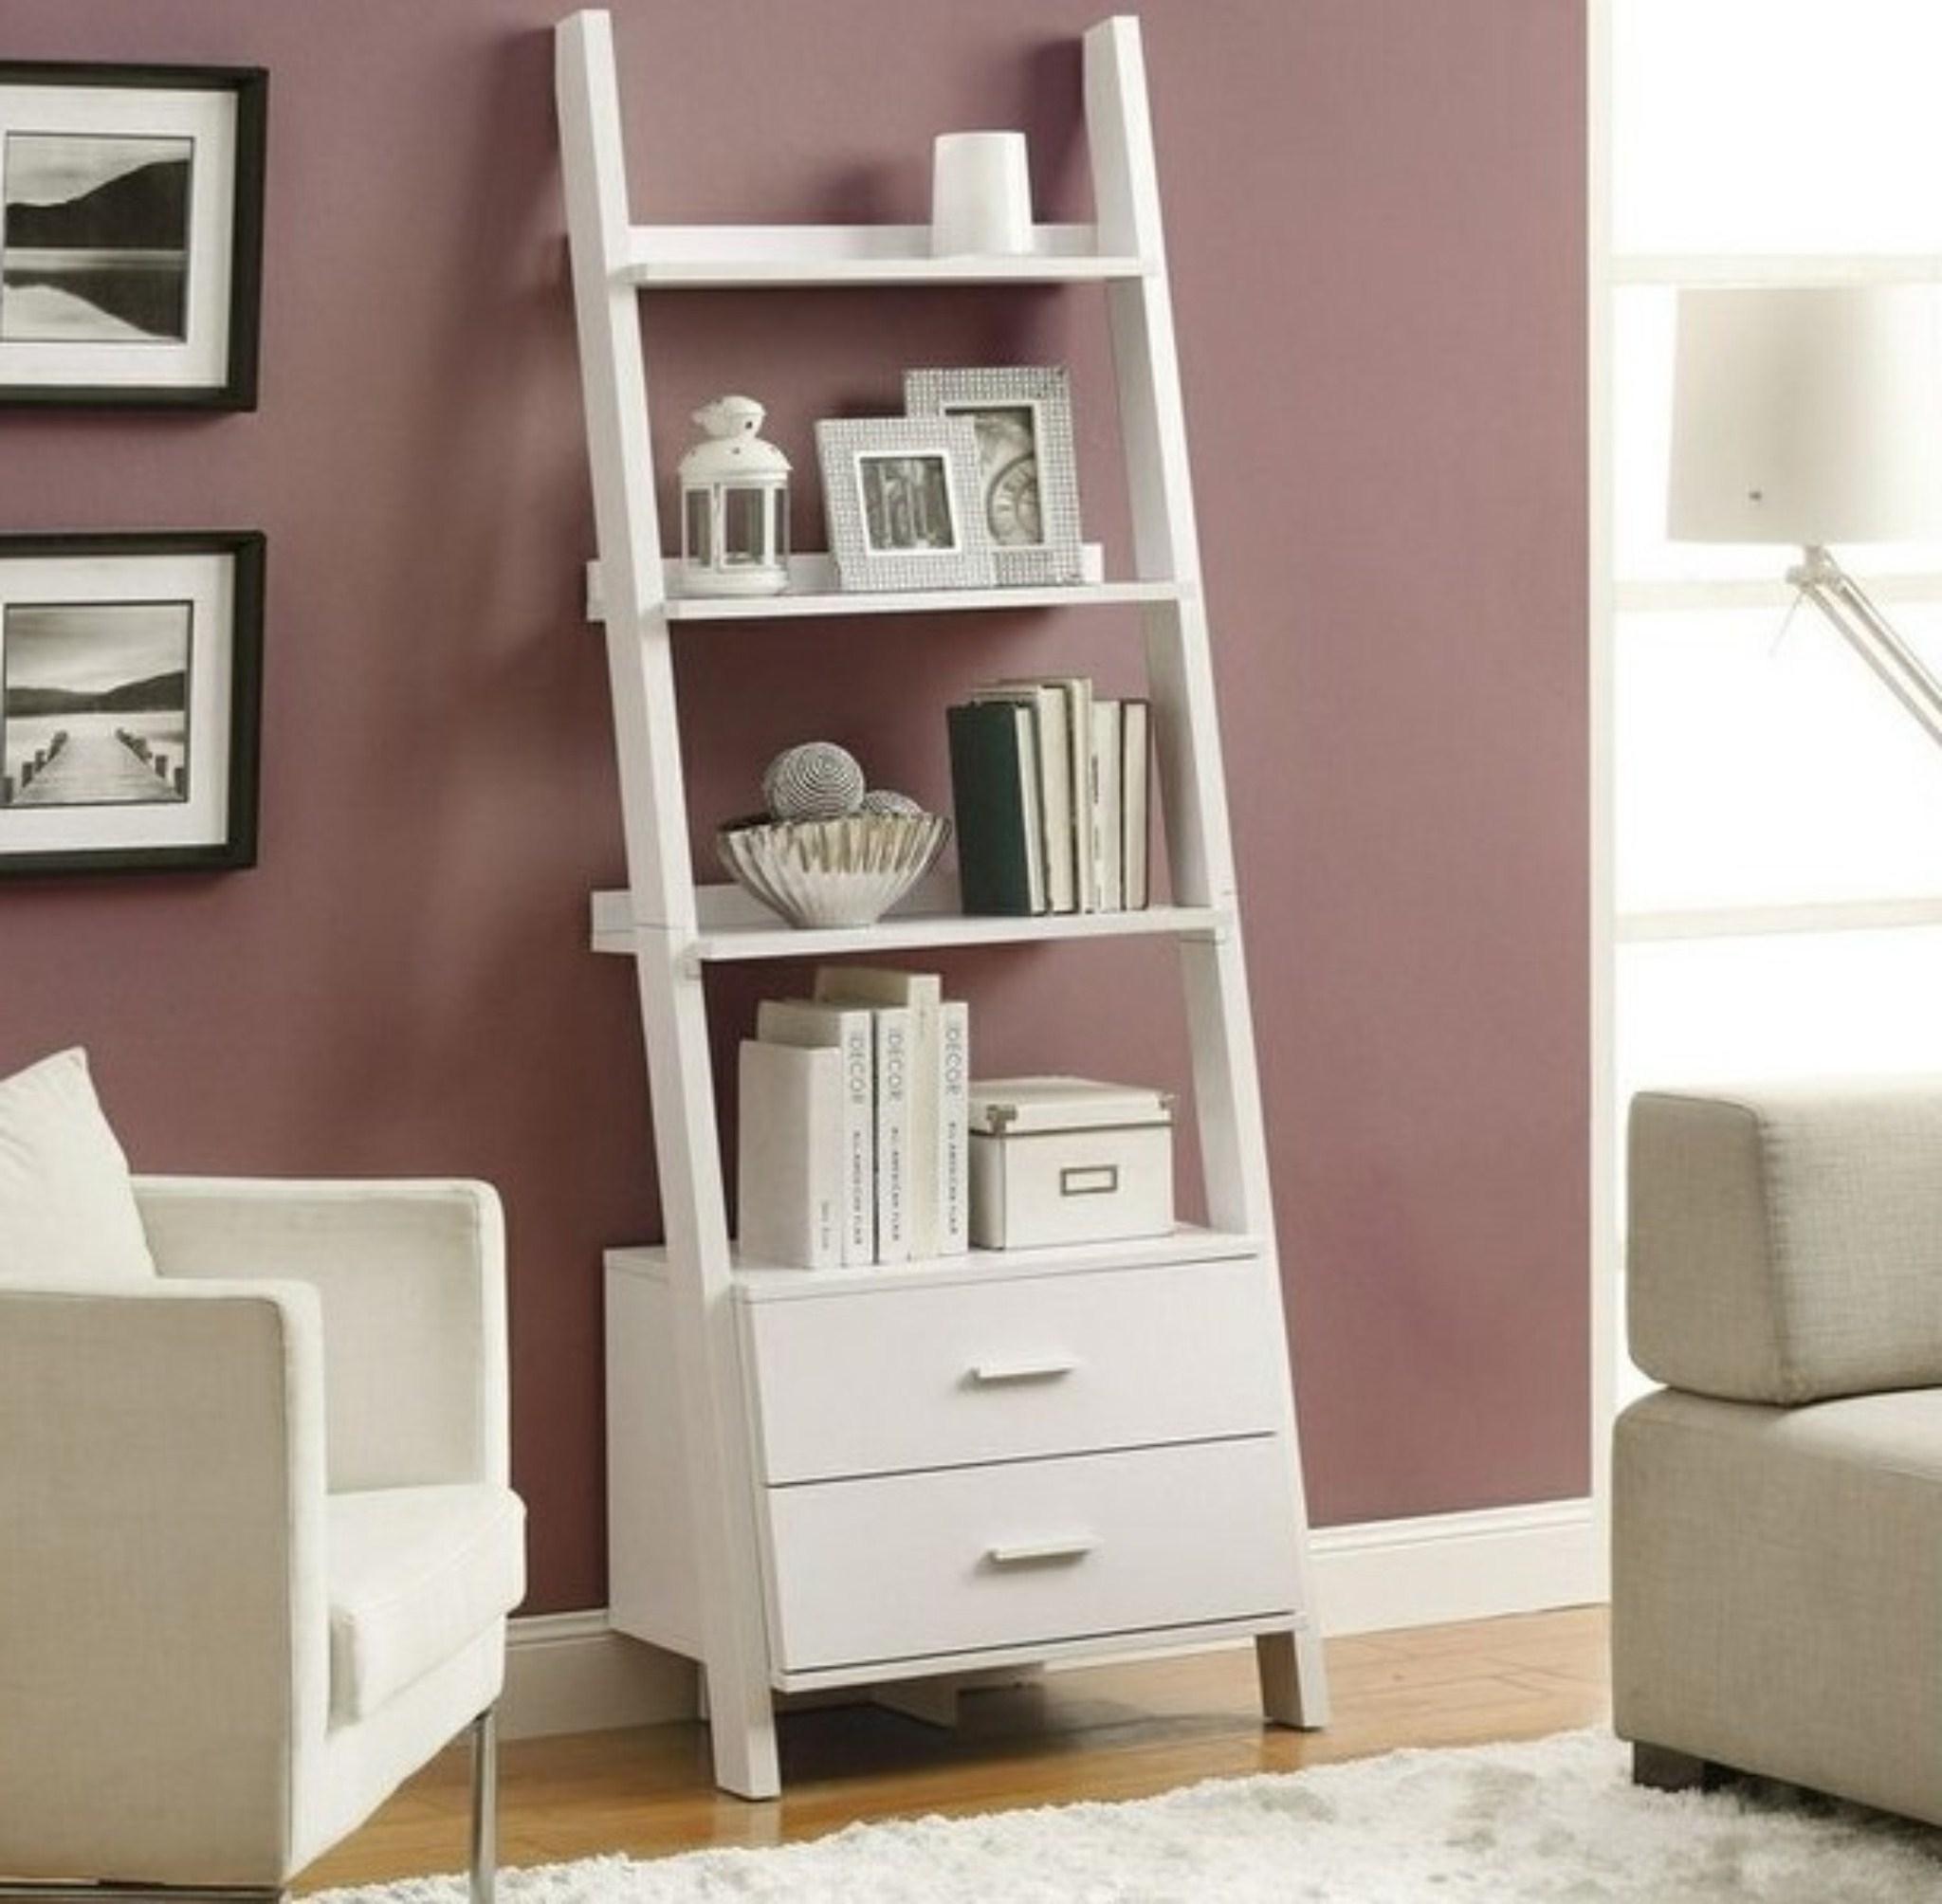 Fashionable White Ladder Shelf Bookcase For Contemporary Living Room Design Regarding White Ladder Shelf (View 4 of 15)